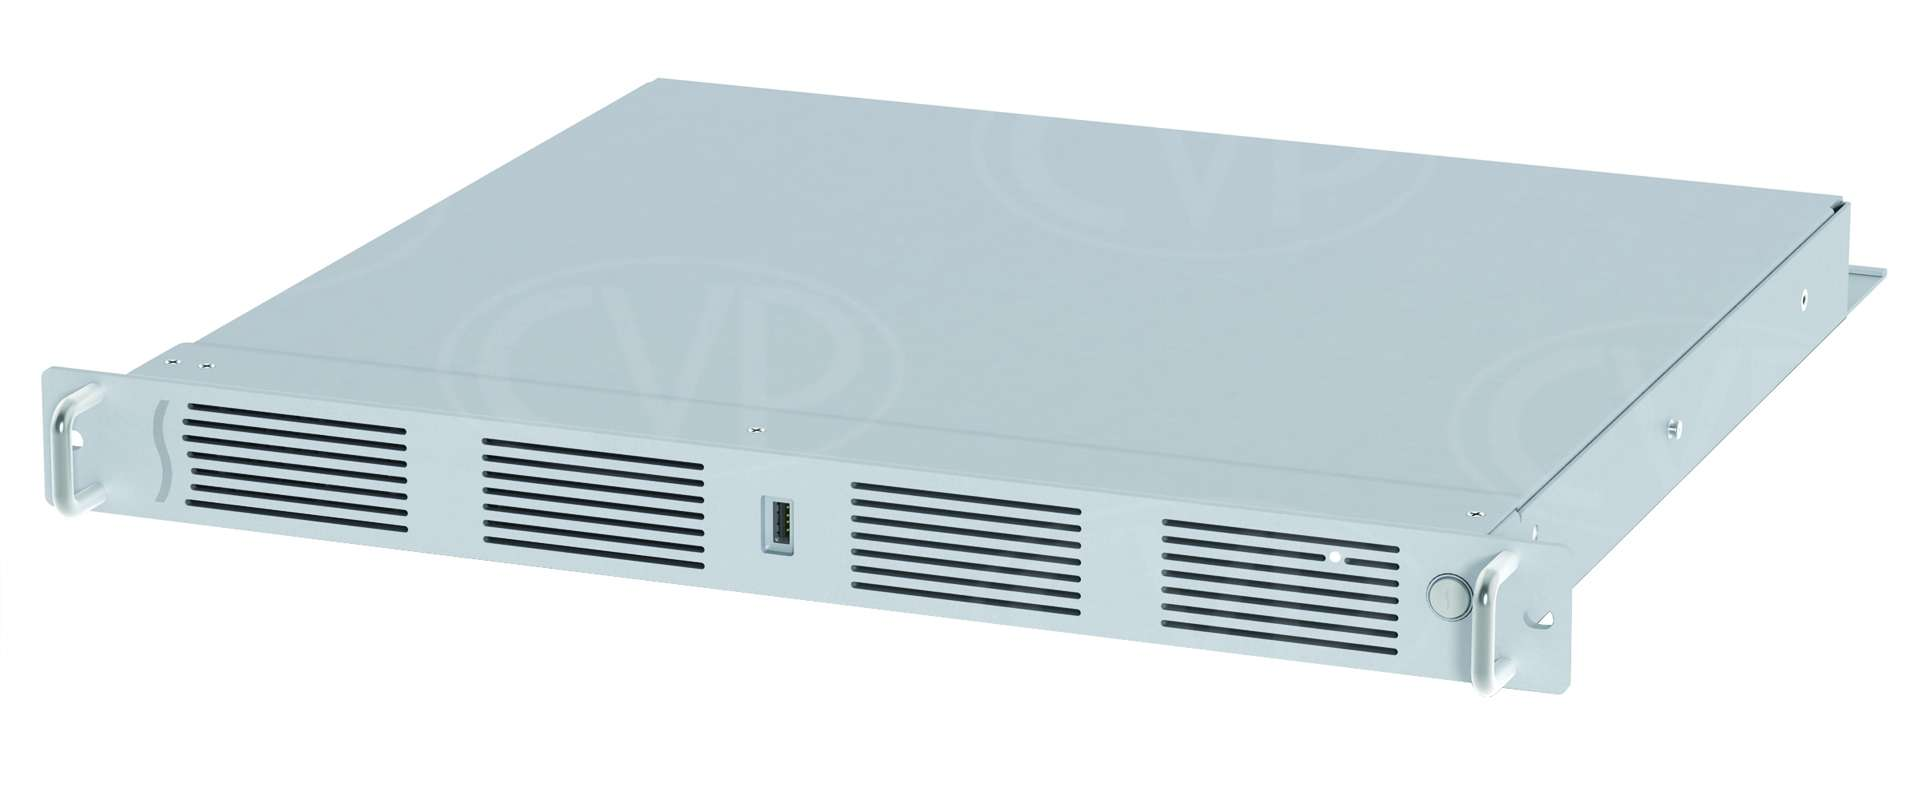 Sonnet XMAC-MS xMac Mini Server